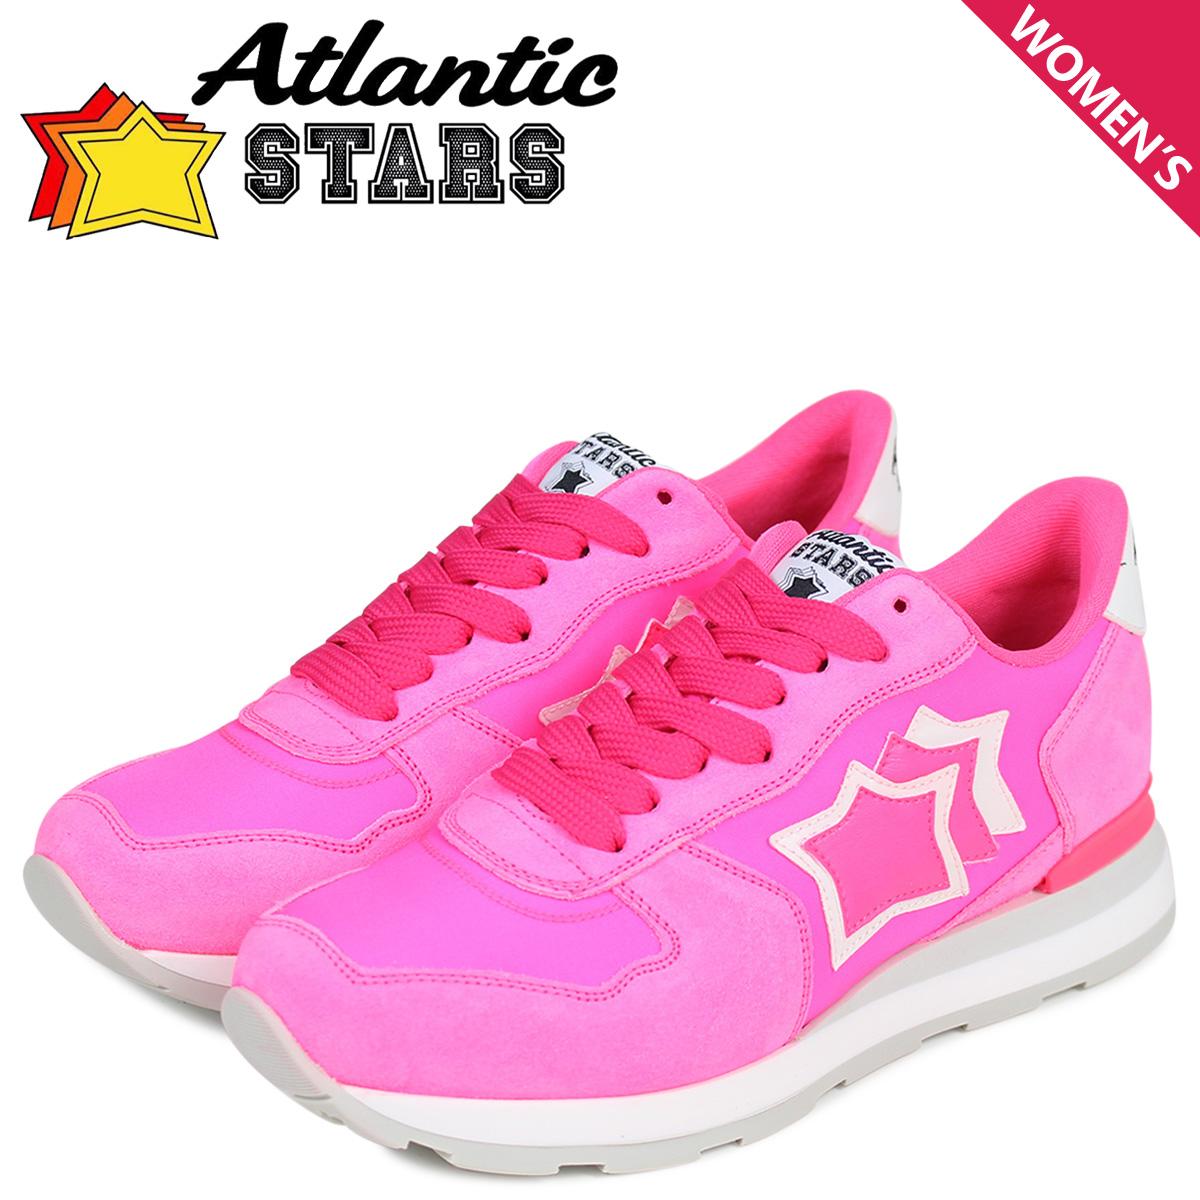 Atlantic STARS レディース スニーカー アトランティックスターズ ベガ VEGA UVP-86FF ピンク